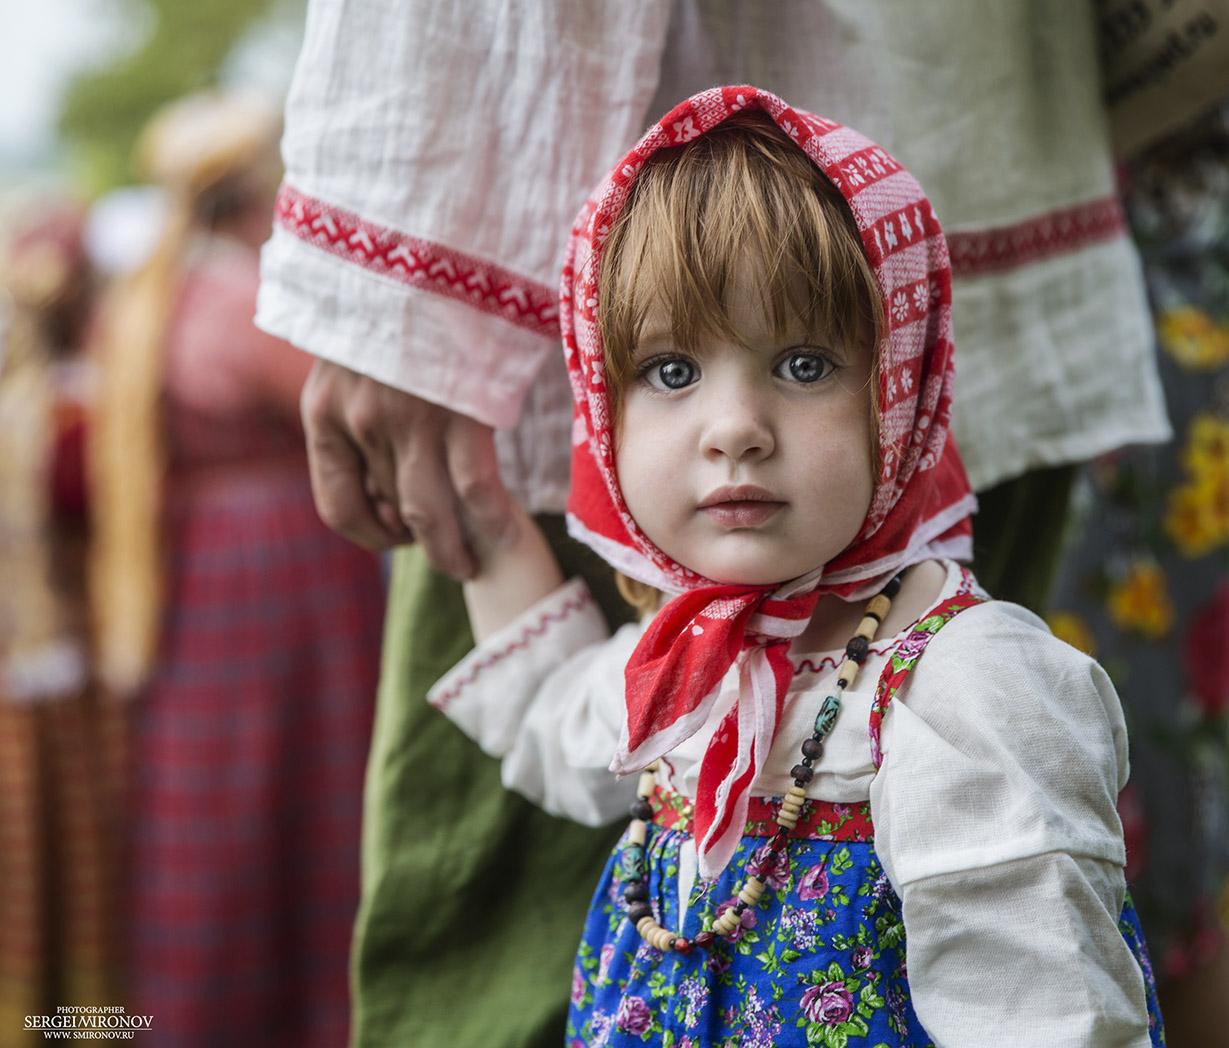 Куколка | Дети | Фотография #133588